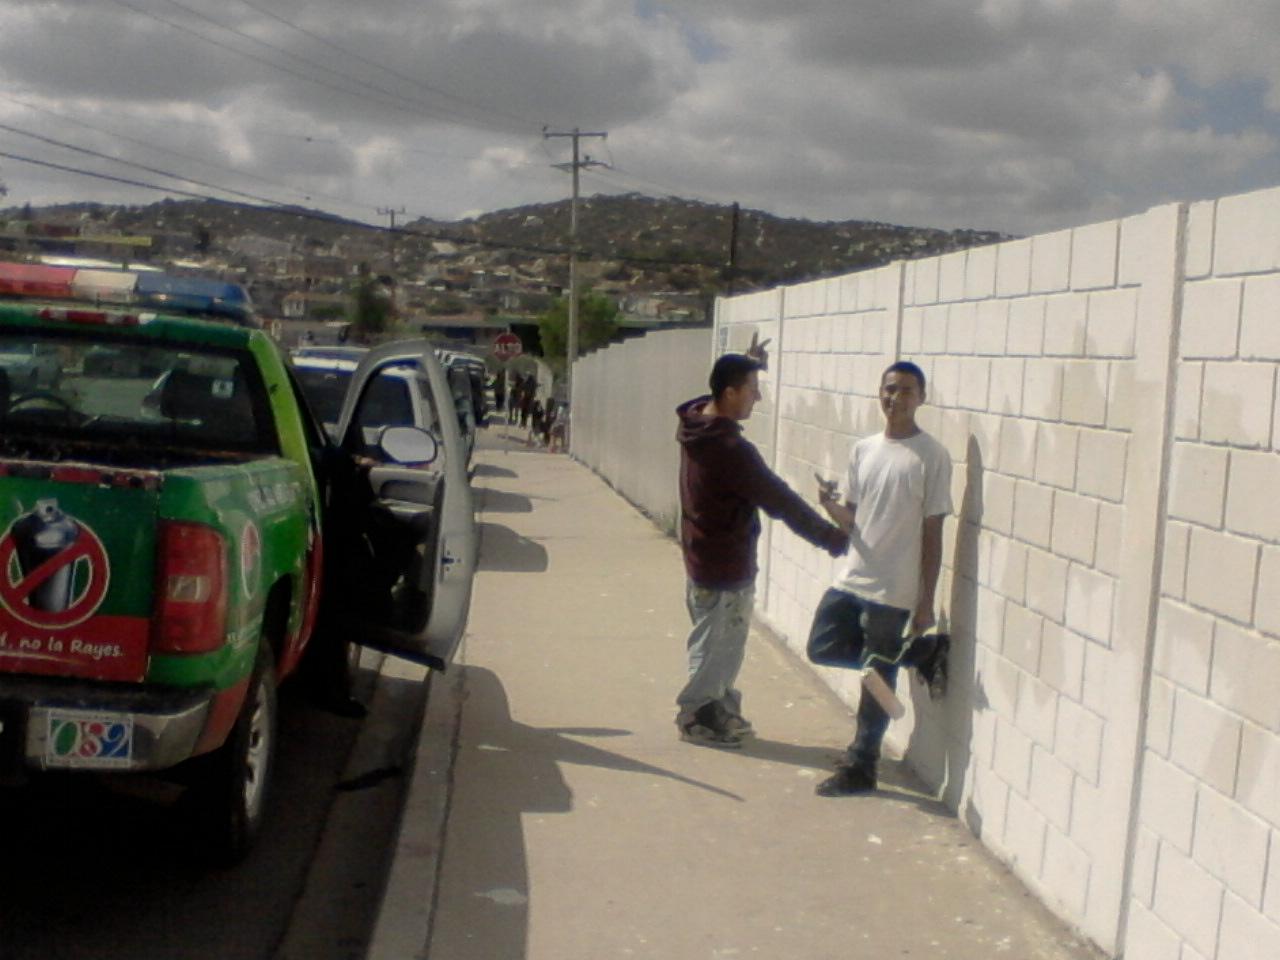 Arrasando la noticia grafiteros a pintar paredes - Programa para pintar paredes ...